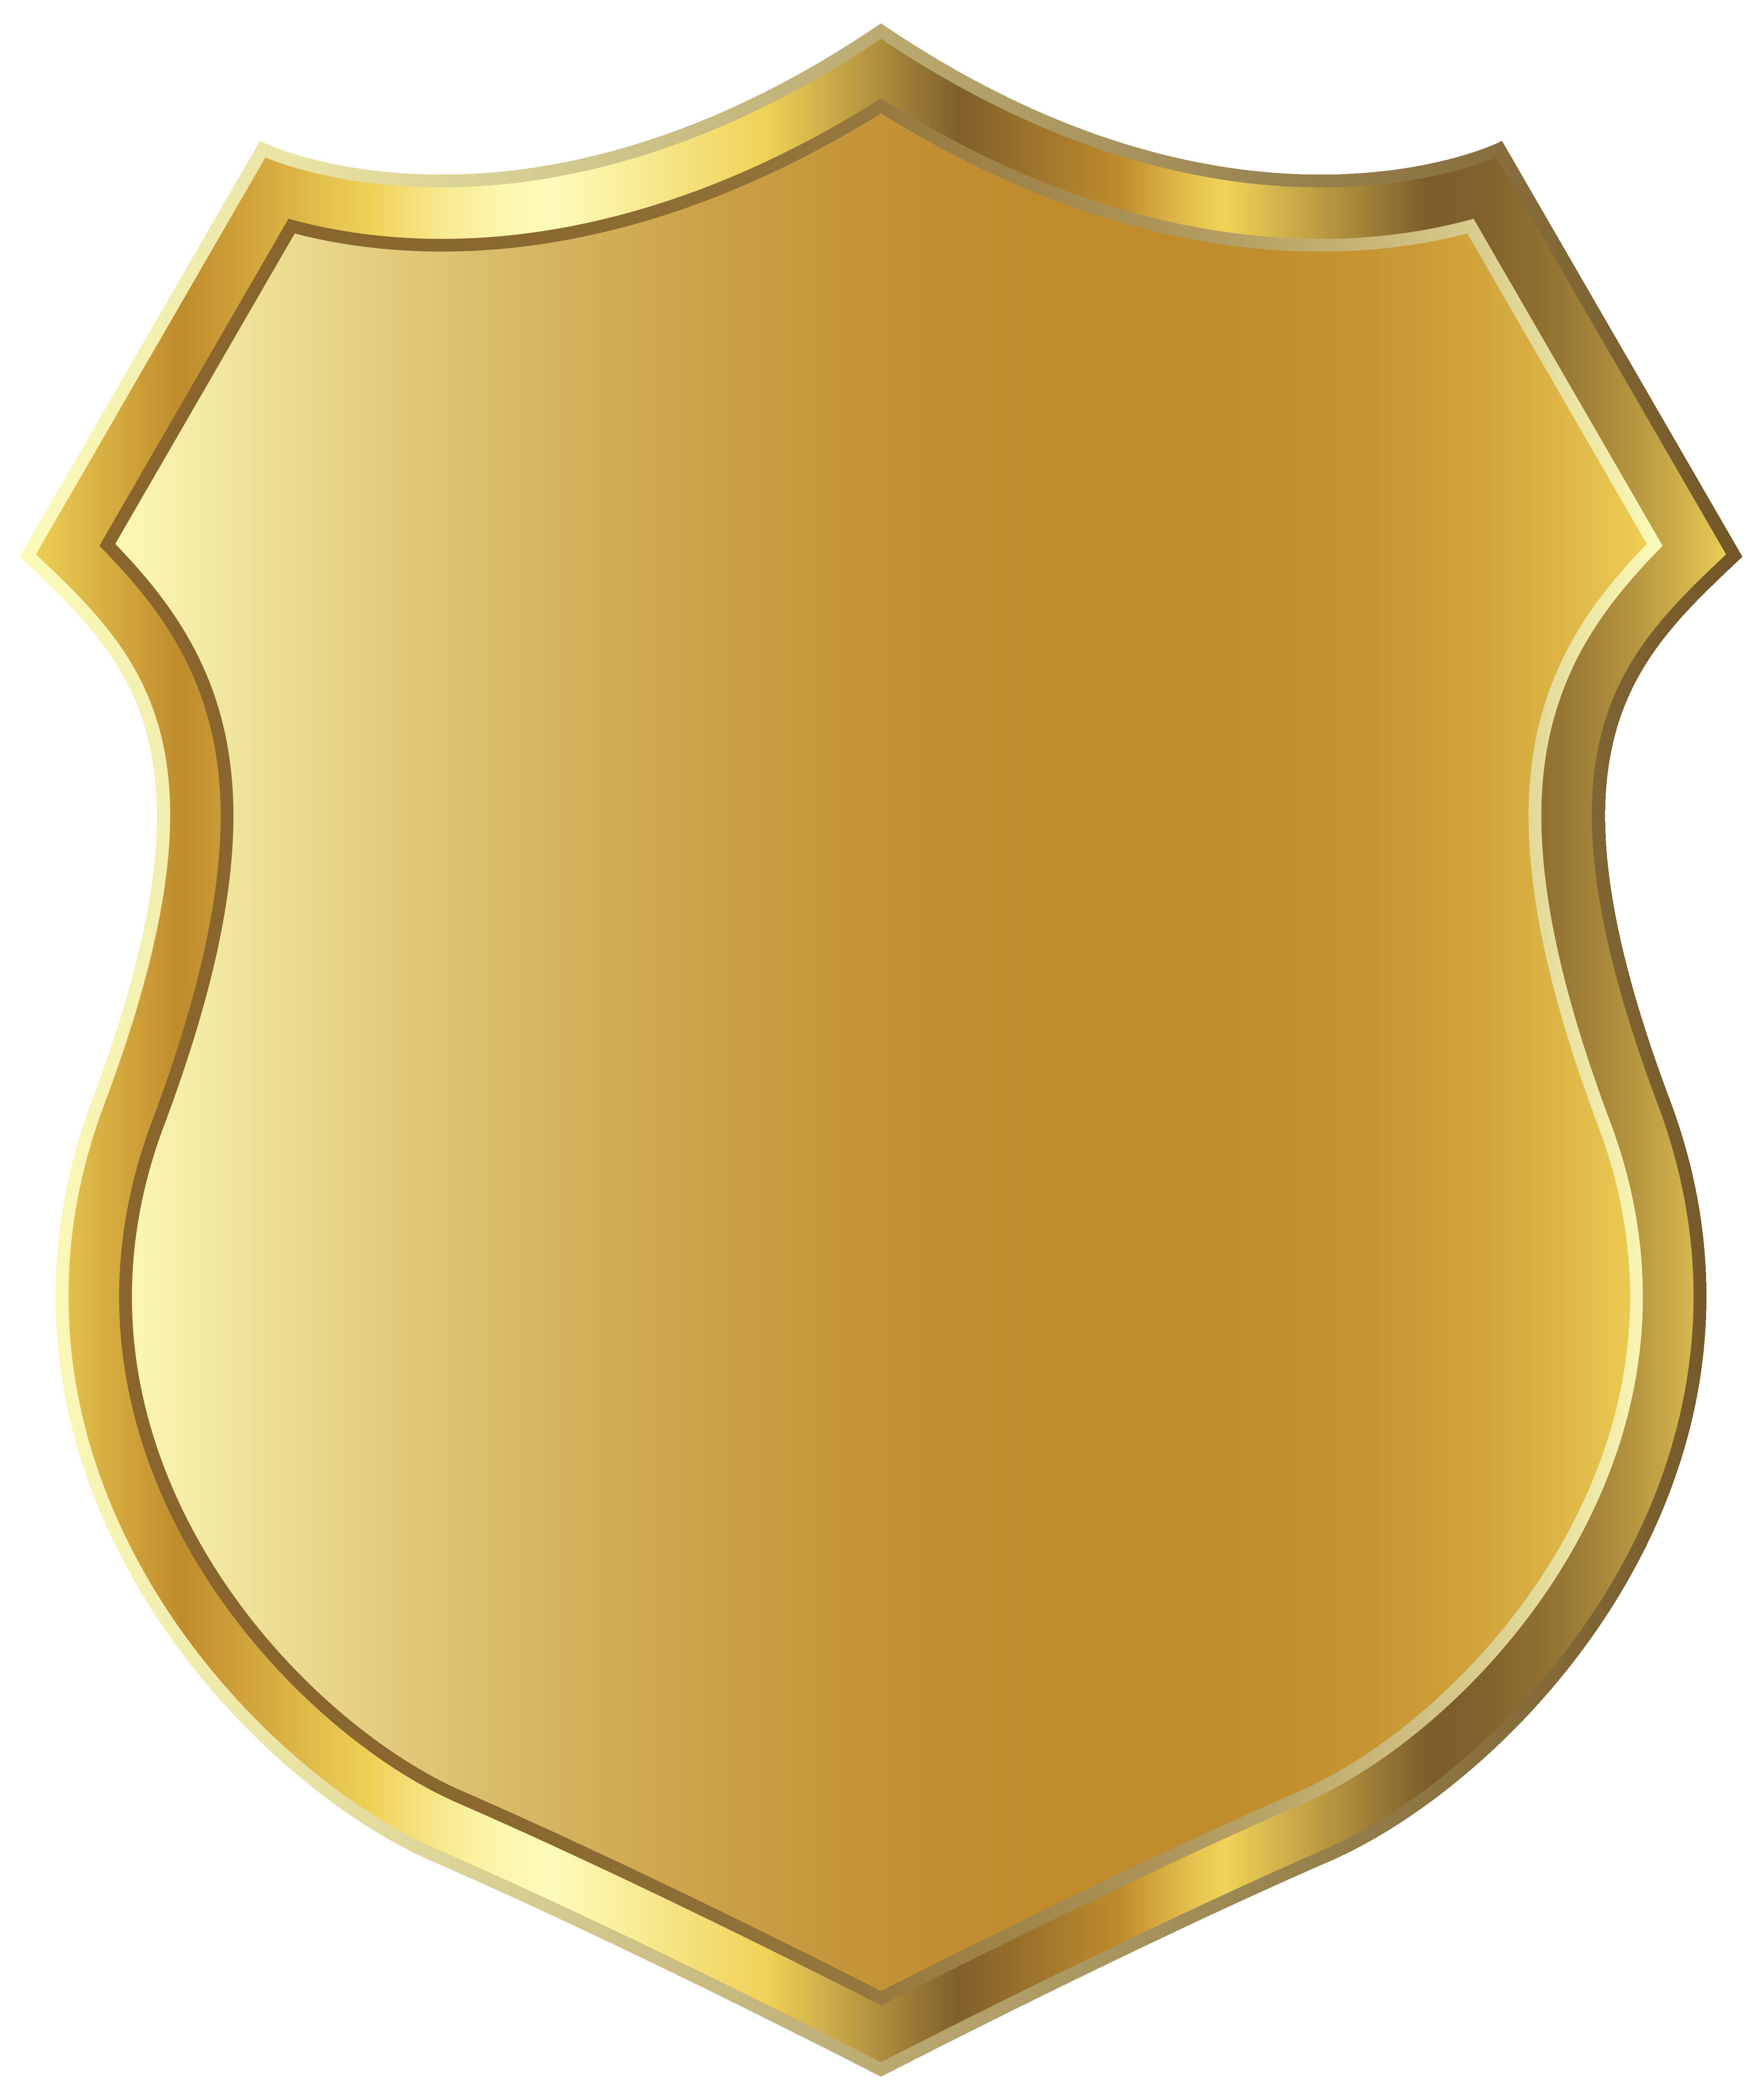 golden badge template clipart png picture borders frames goldy pinterest. Black Bedroom Furniture Sets. Home Design Ideas